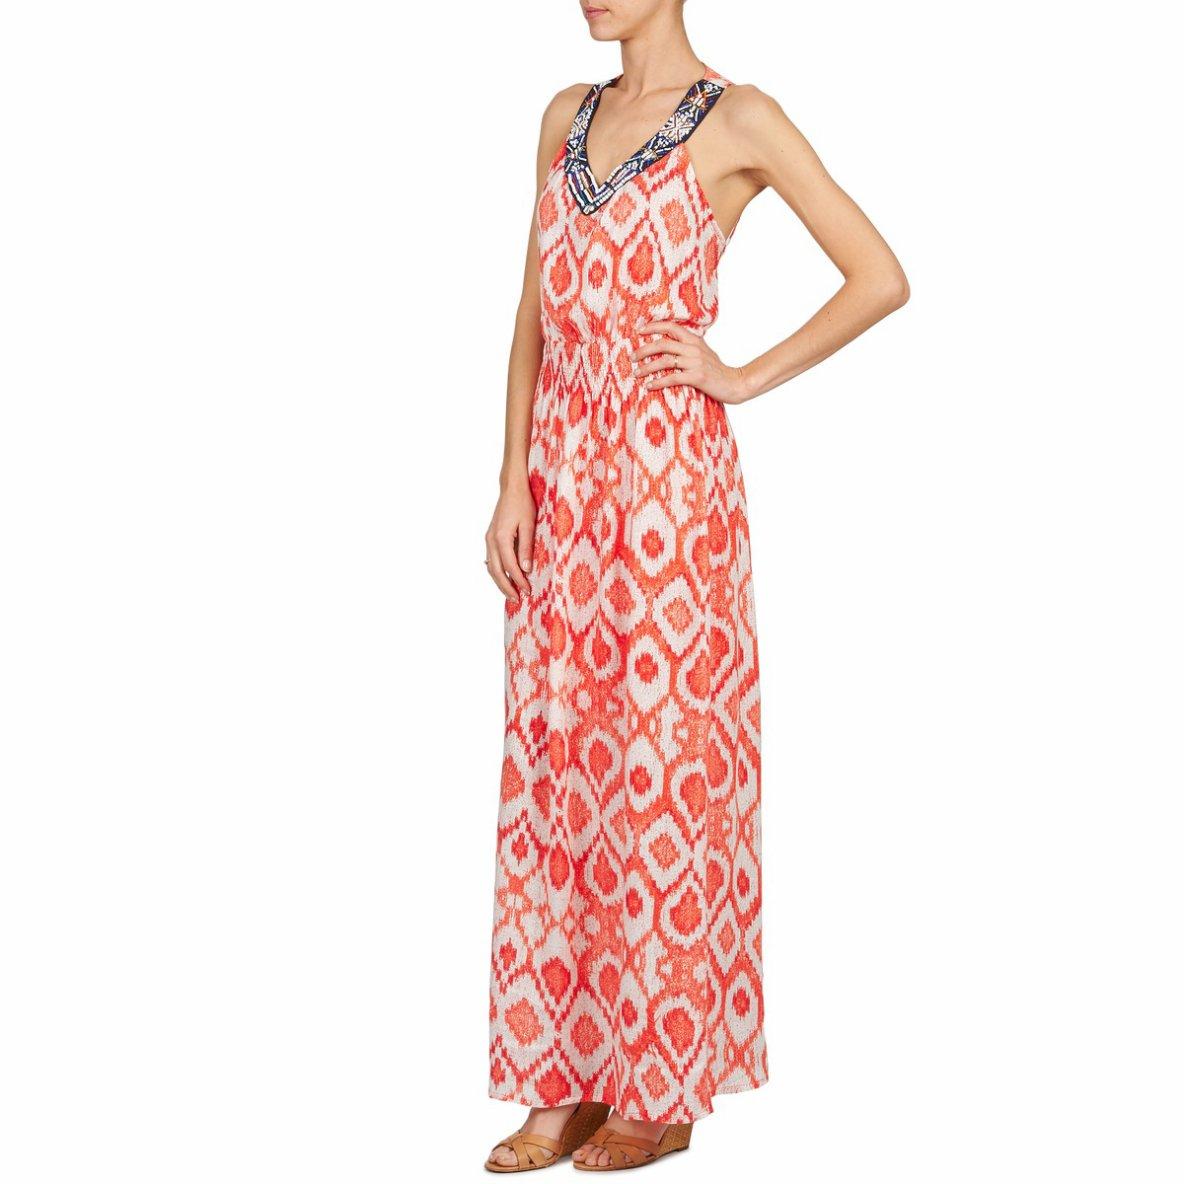 robe longue desigual maisa rouge robe femme desigual spartoo tendance mode femme. Black Bedroom Furniture Sets. Home Design Ideas